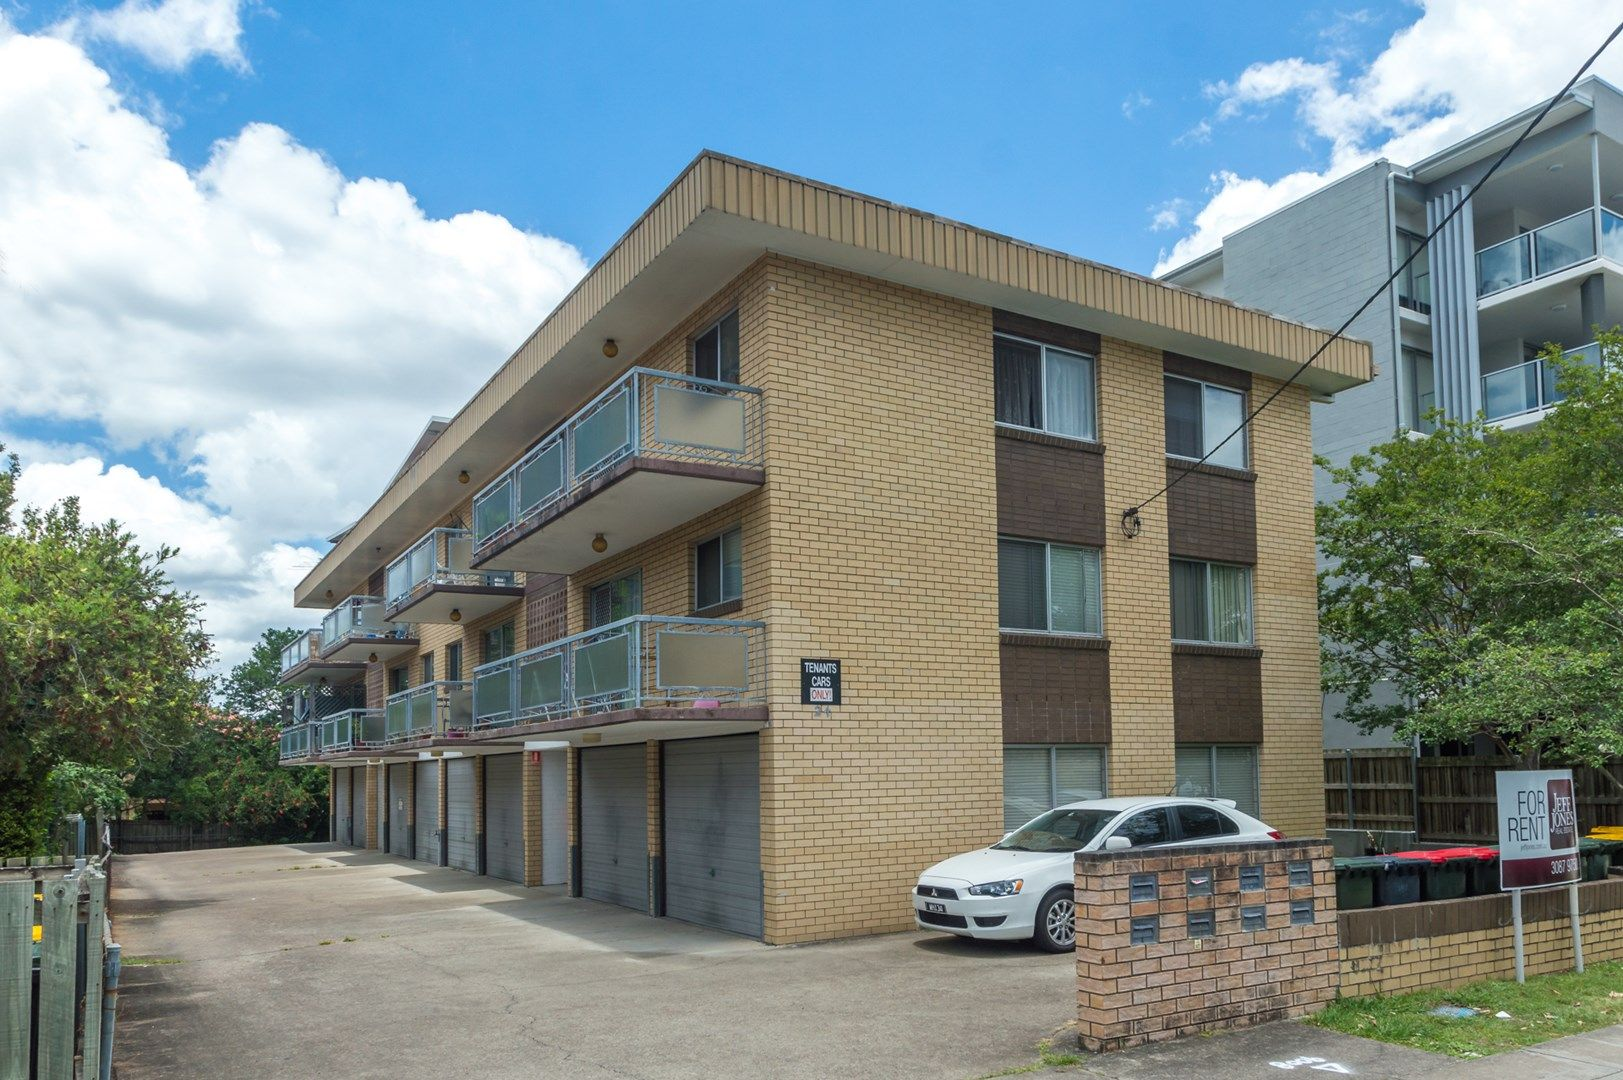 3/24 Carl Street, Woolloongabba QLD 4102, Image 0